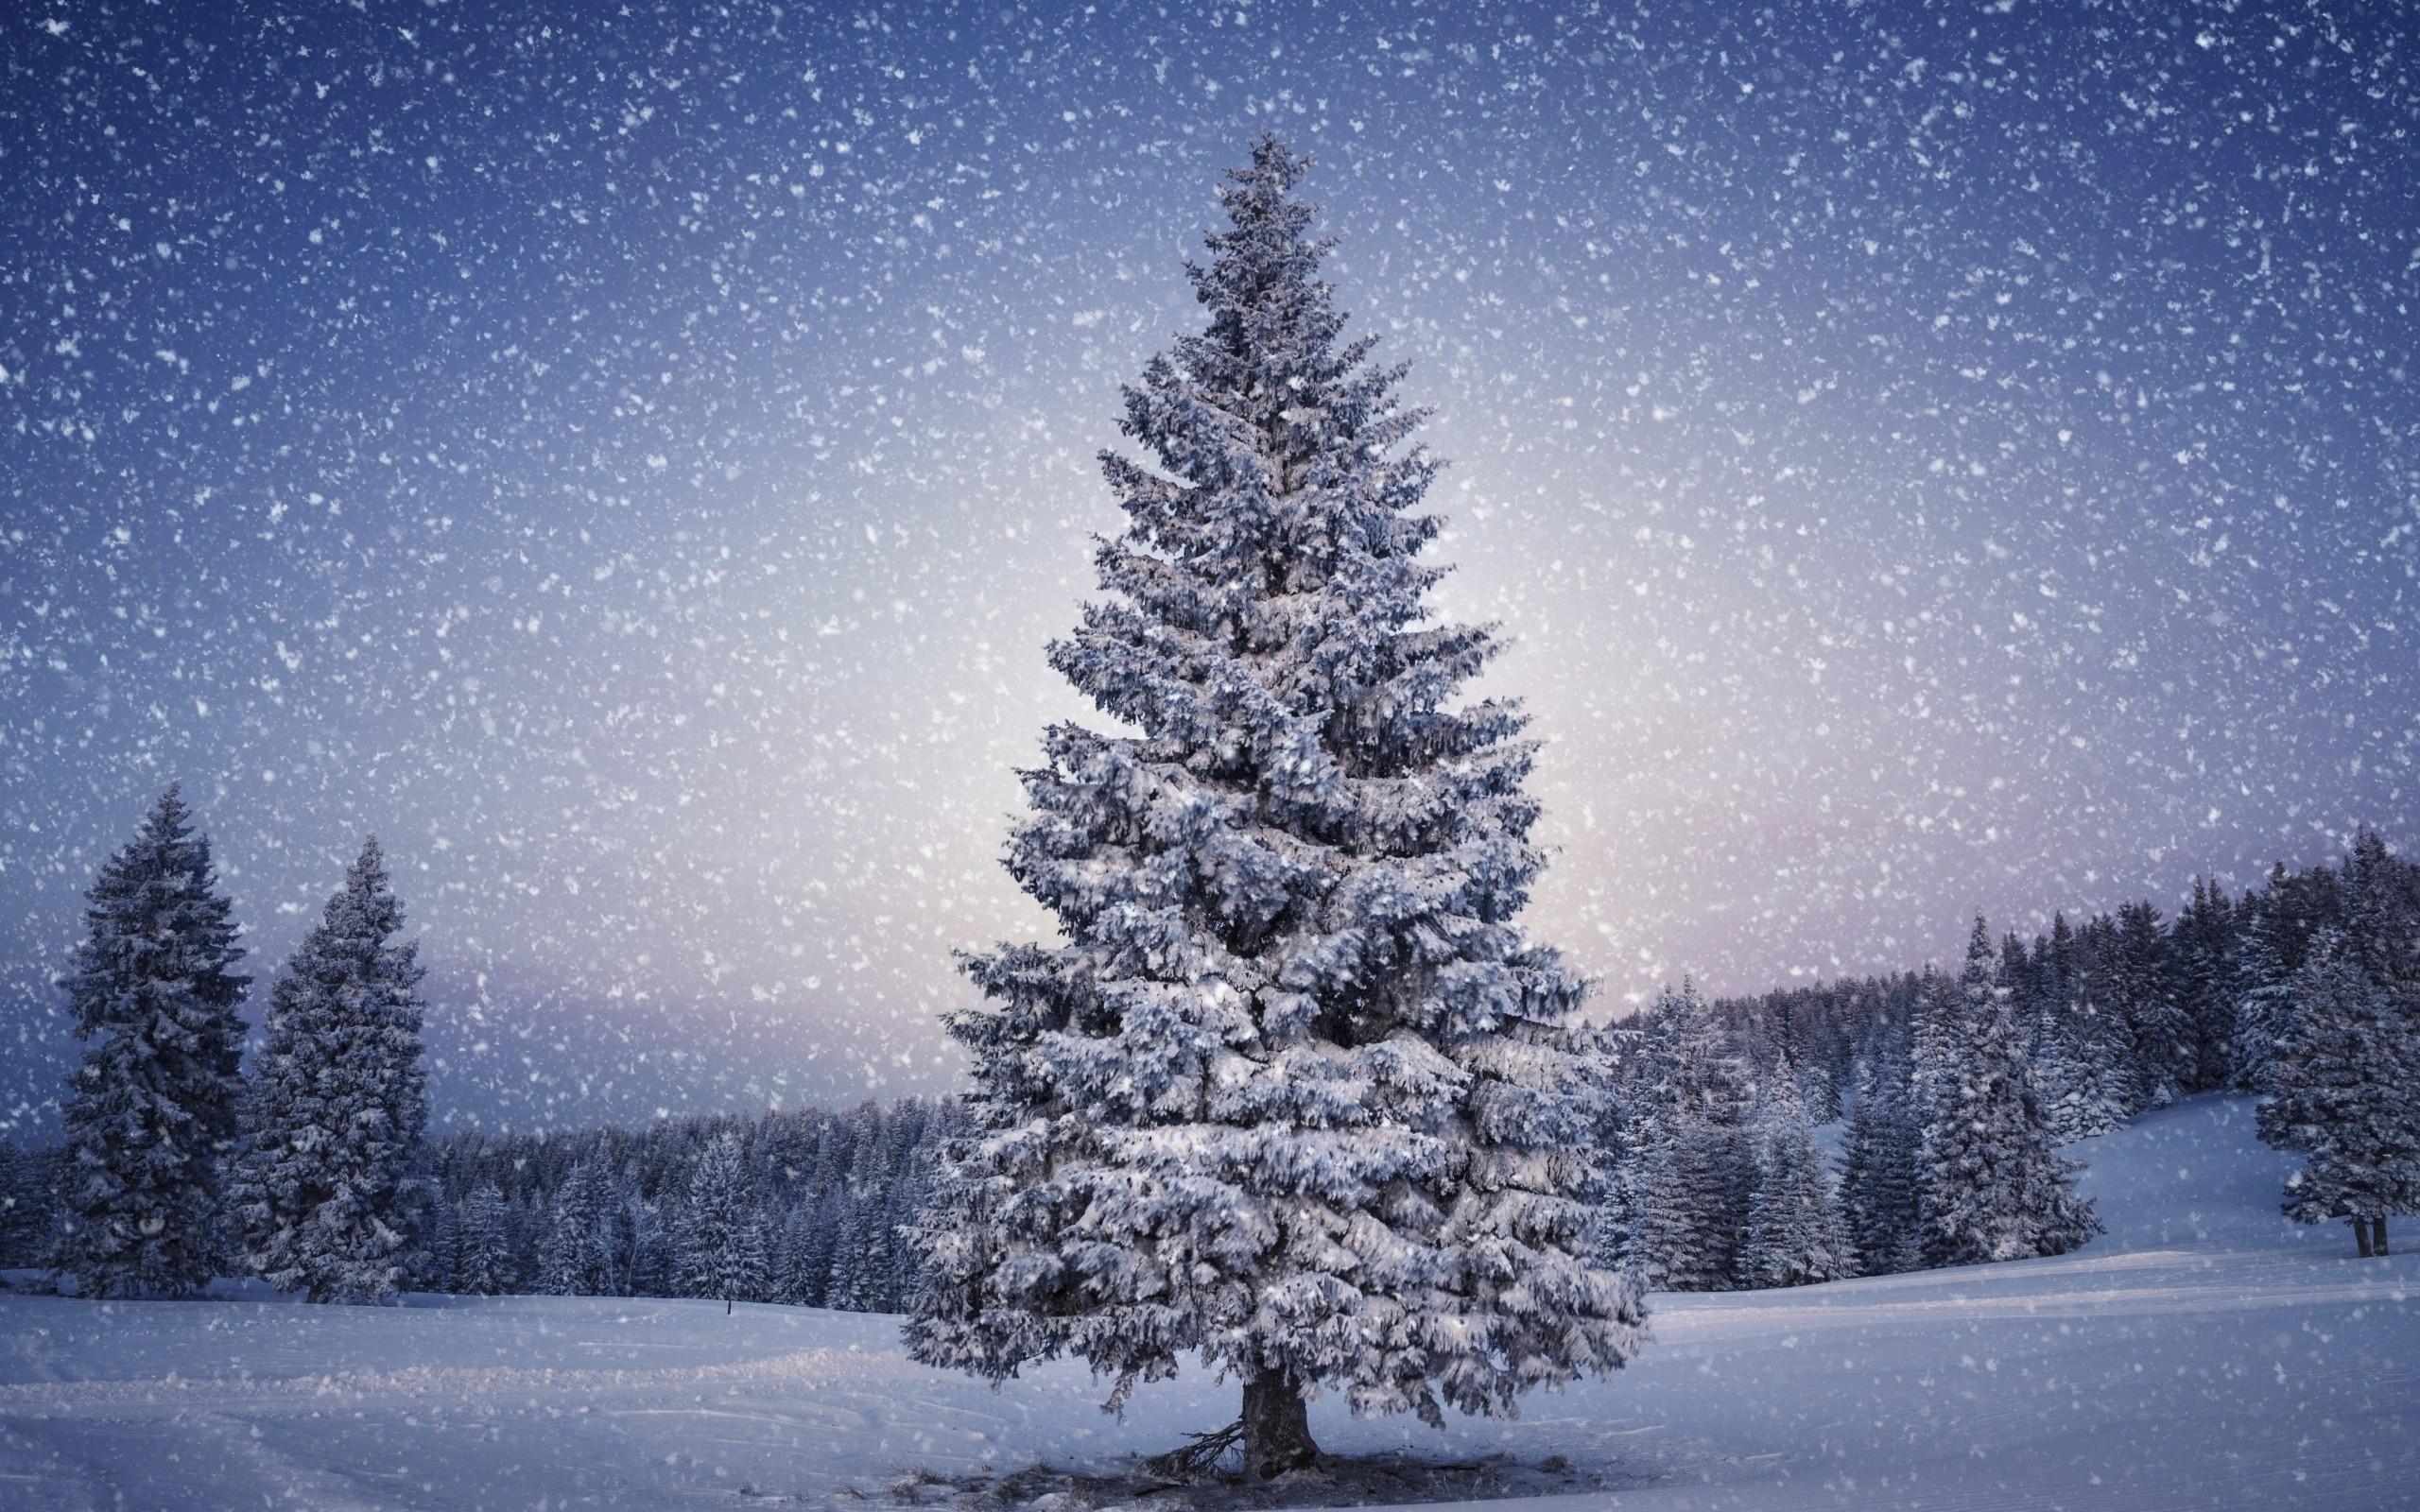 Snowy Christmas Tree HD Wallpaper